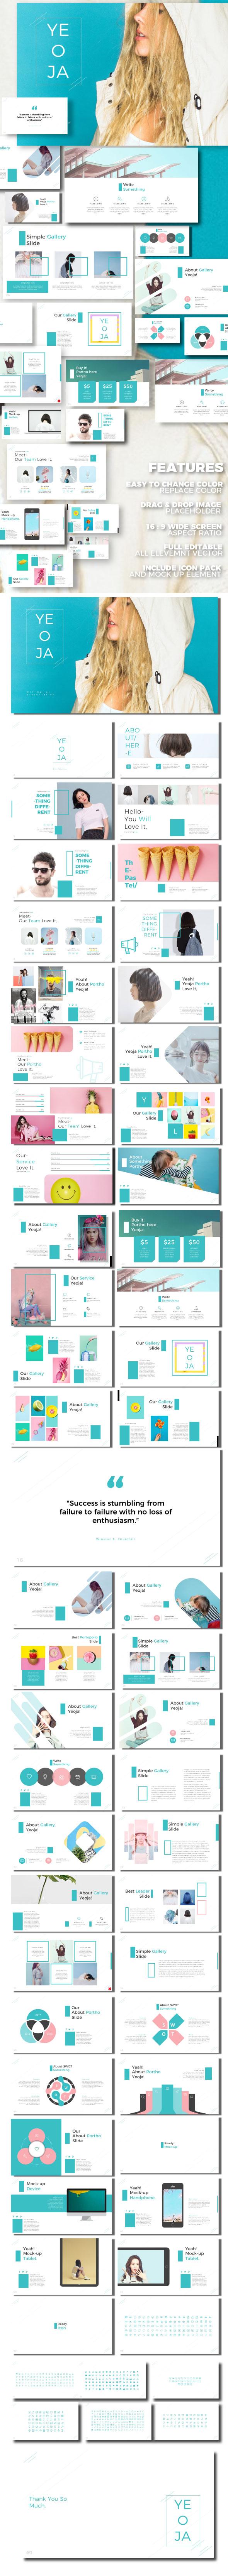 Yeoja - Google Slide Presentation Template - Google Slides Presentation Templates